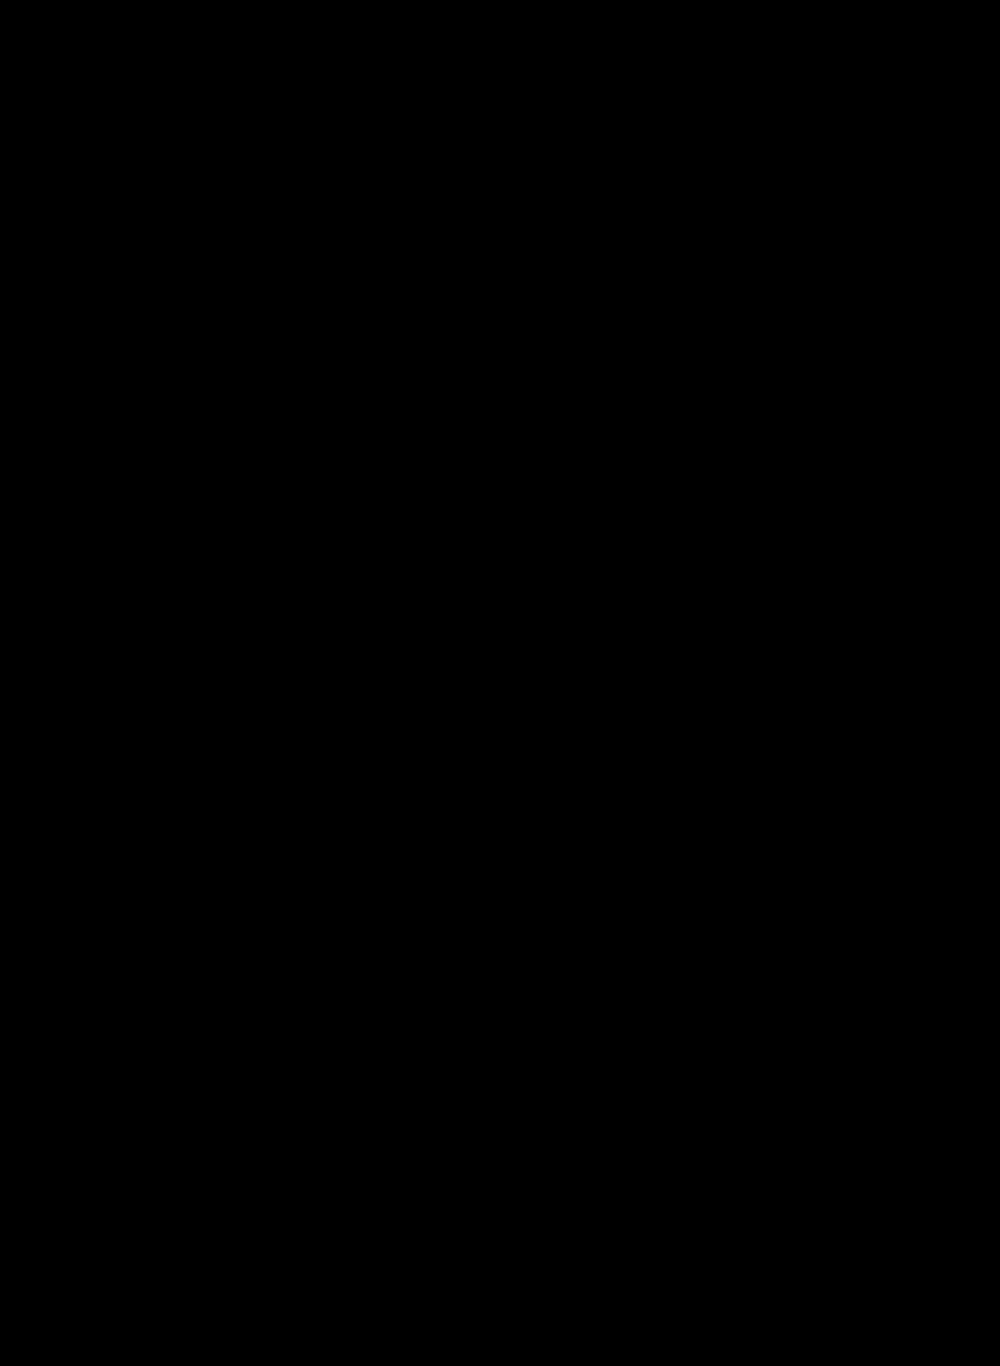 WCM0028.png